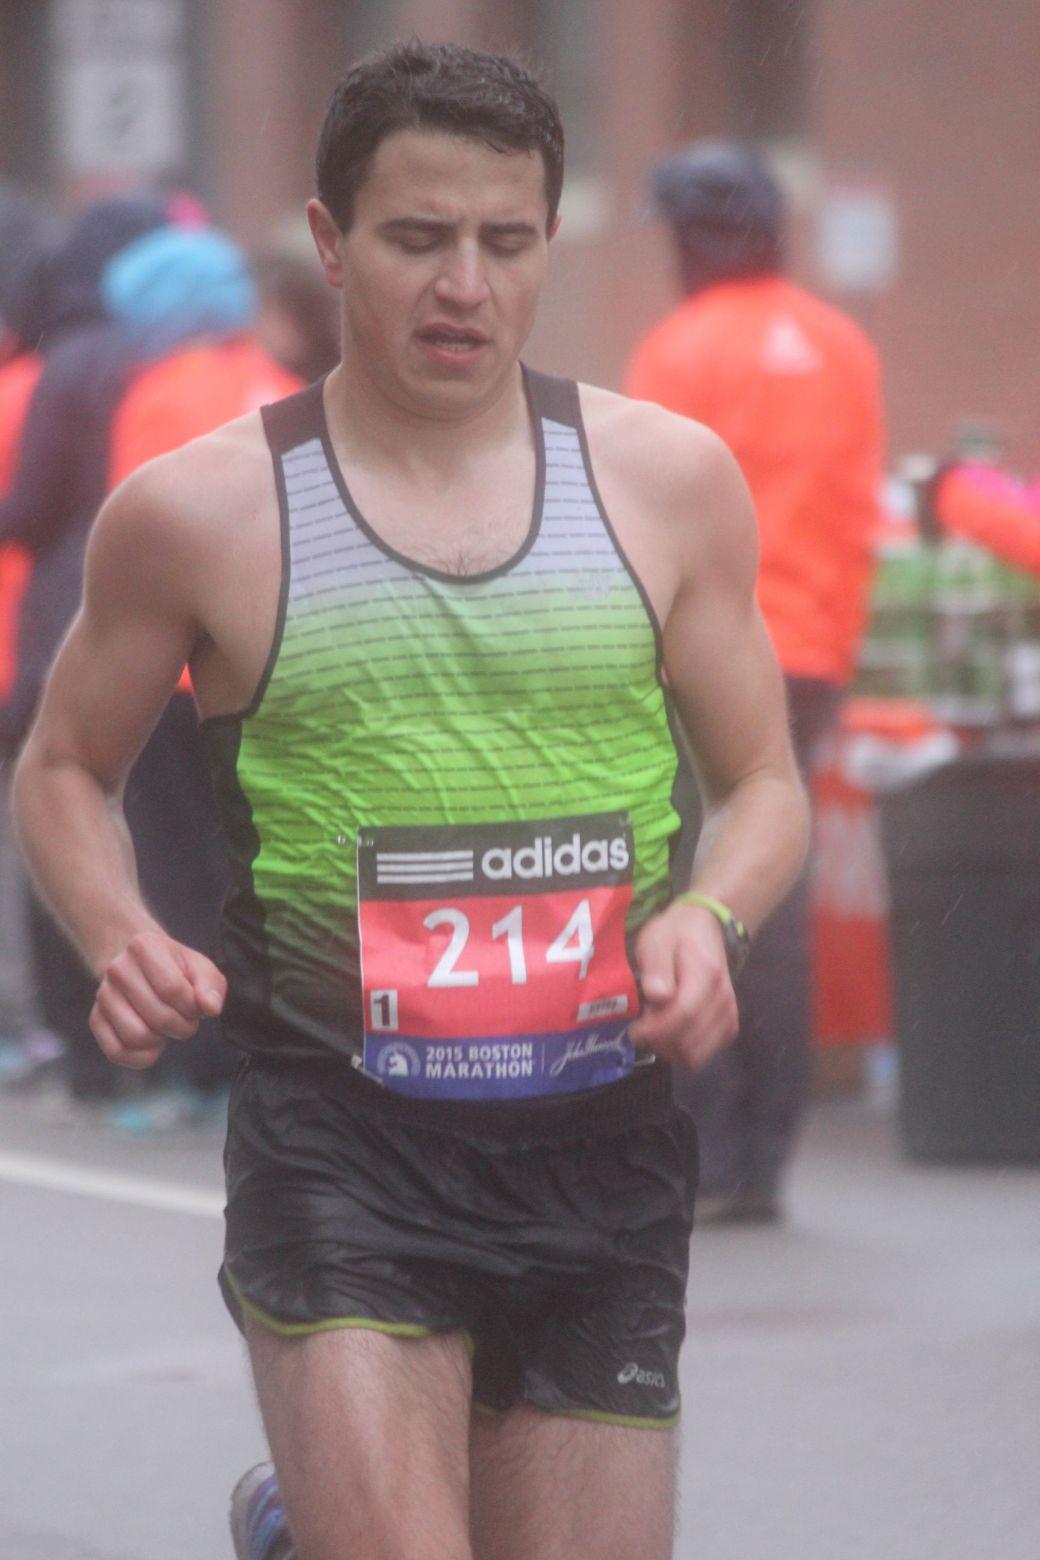 boston marathon april 20 2015 racer number 214